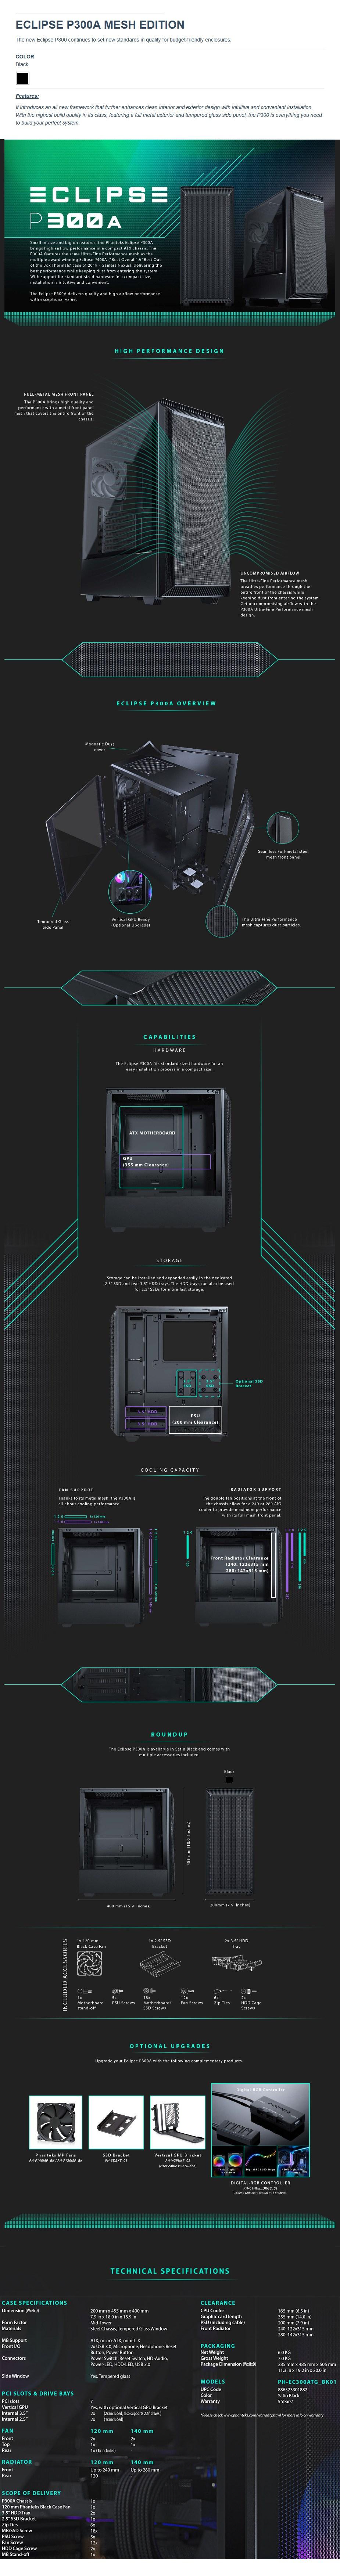 Phanteks Eclipse P300A RGB TG Mid-Tower ATX Case Mesh Edition - Black - Overview 1